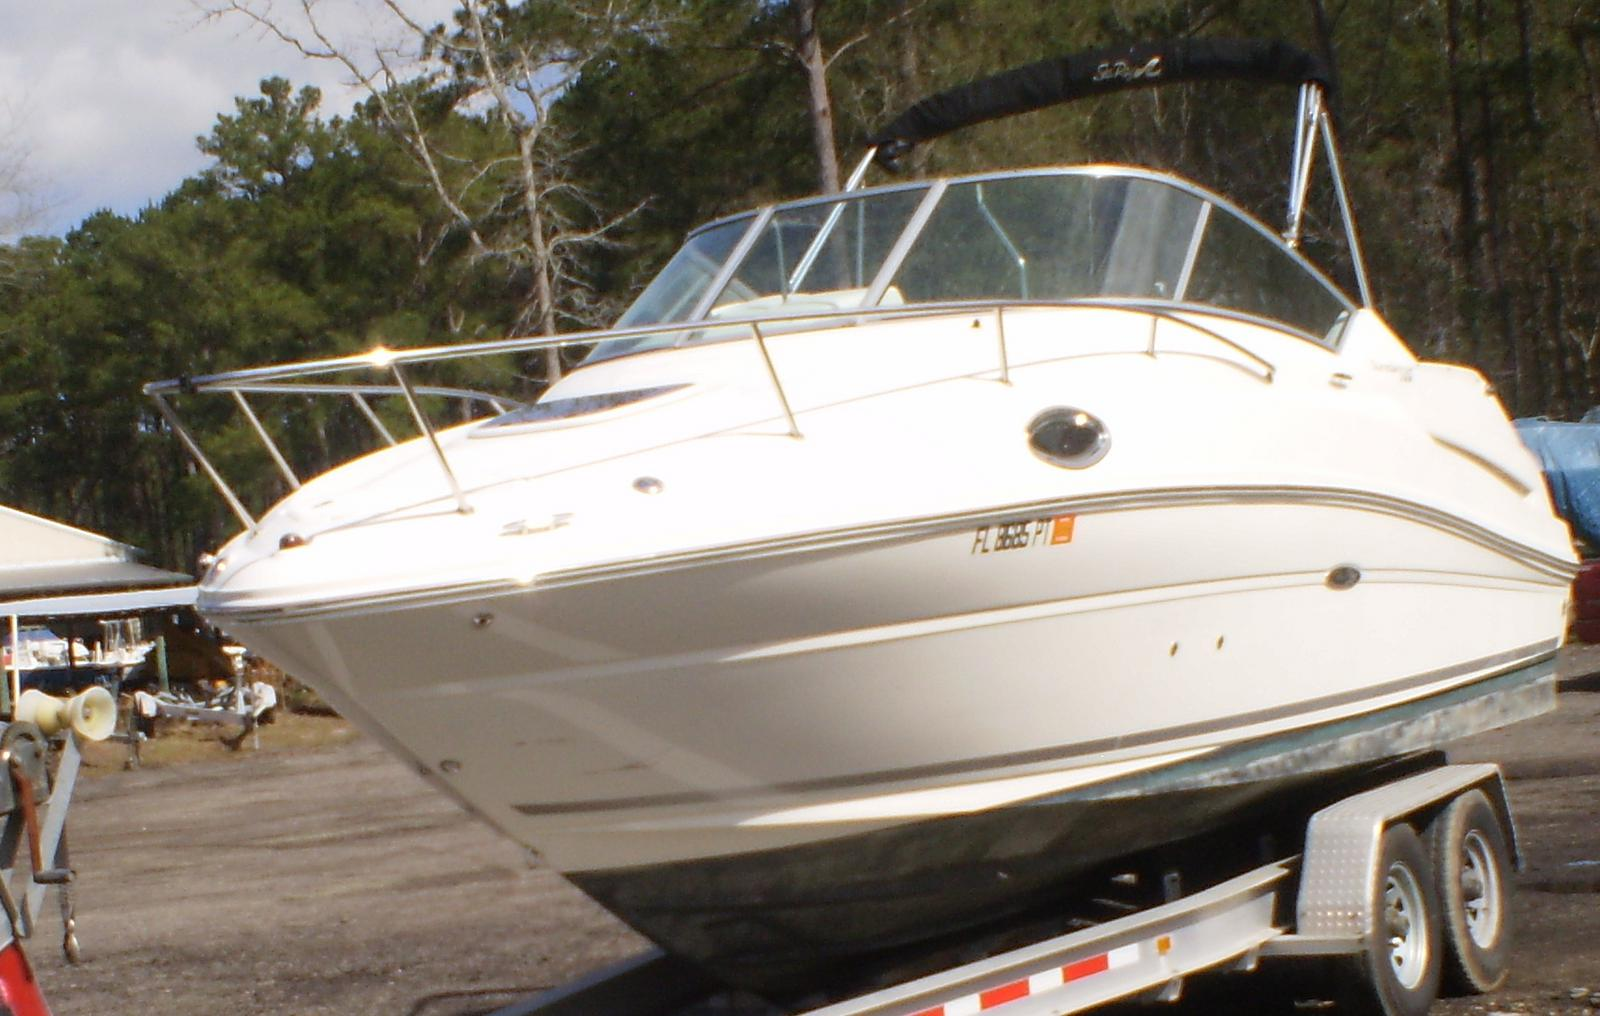 2010 Sea Ray 240 Sundancer® Boat